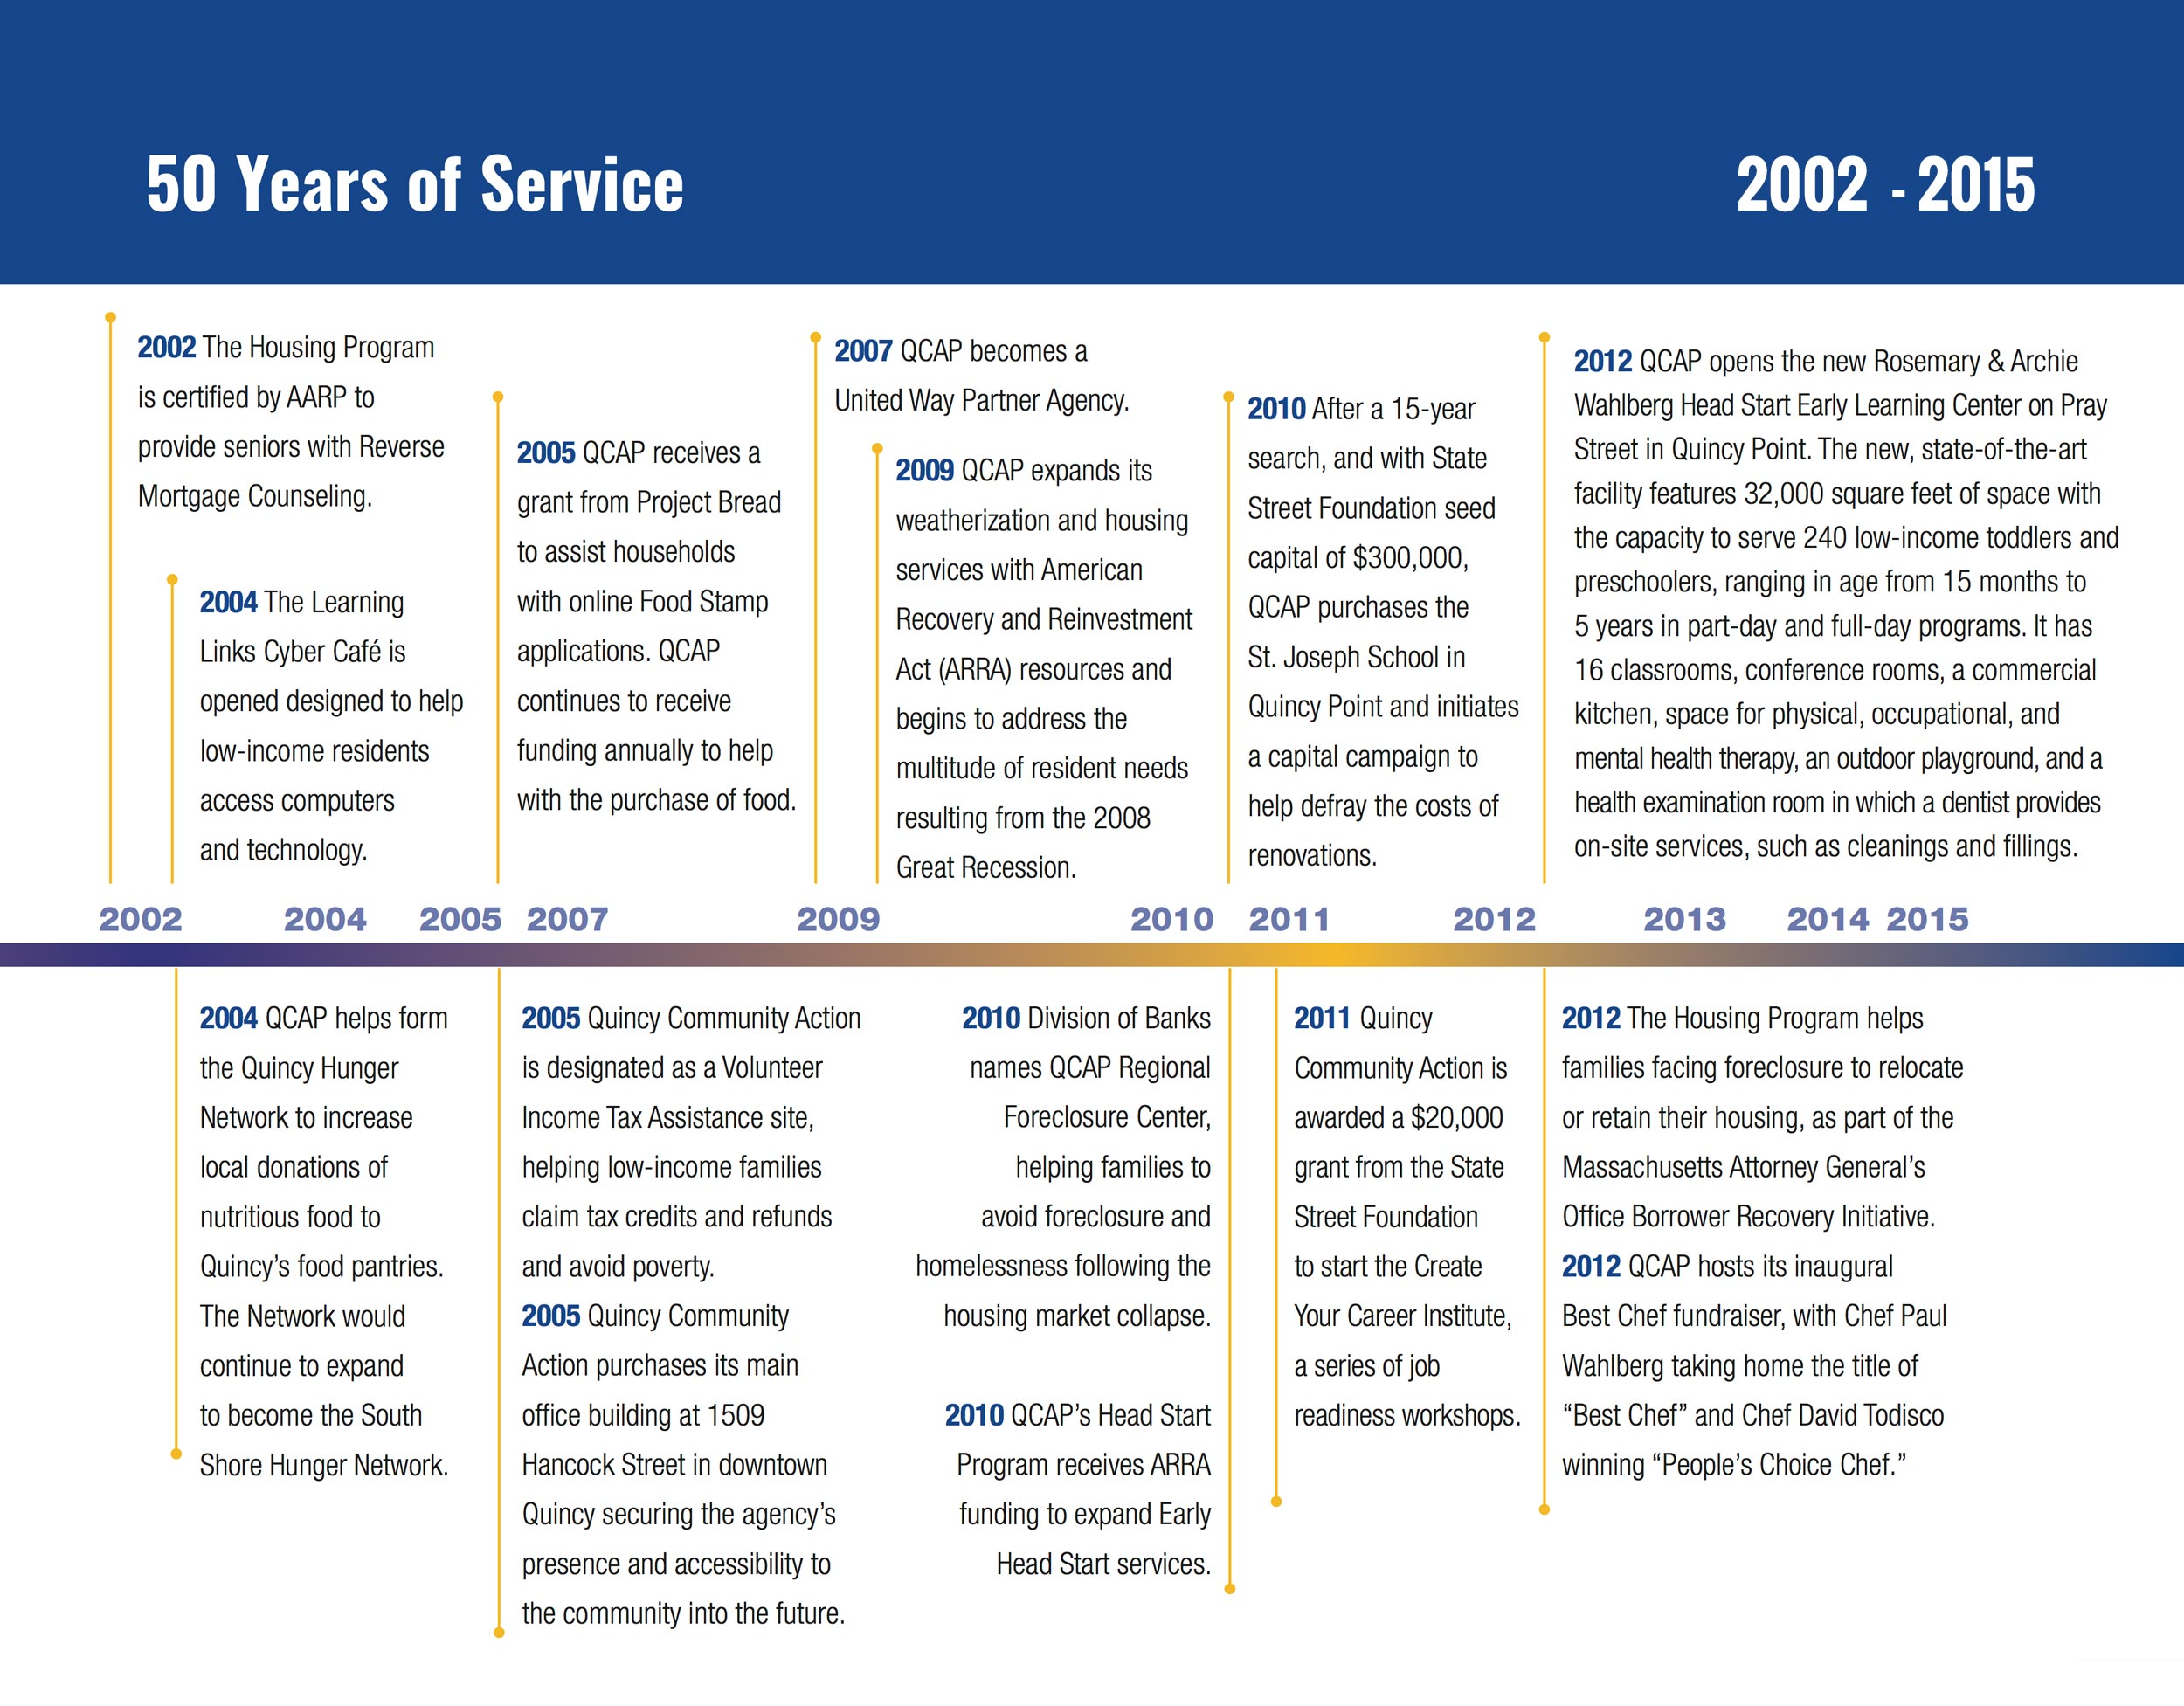 2002 - 2015